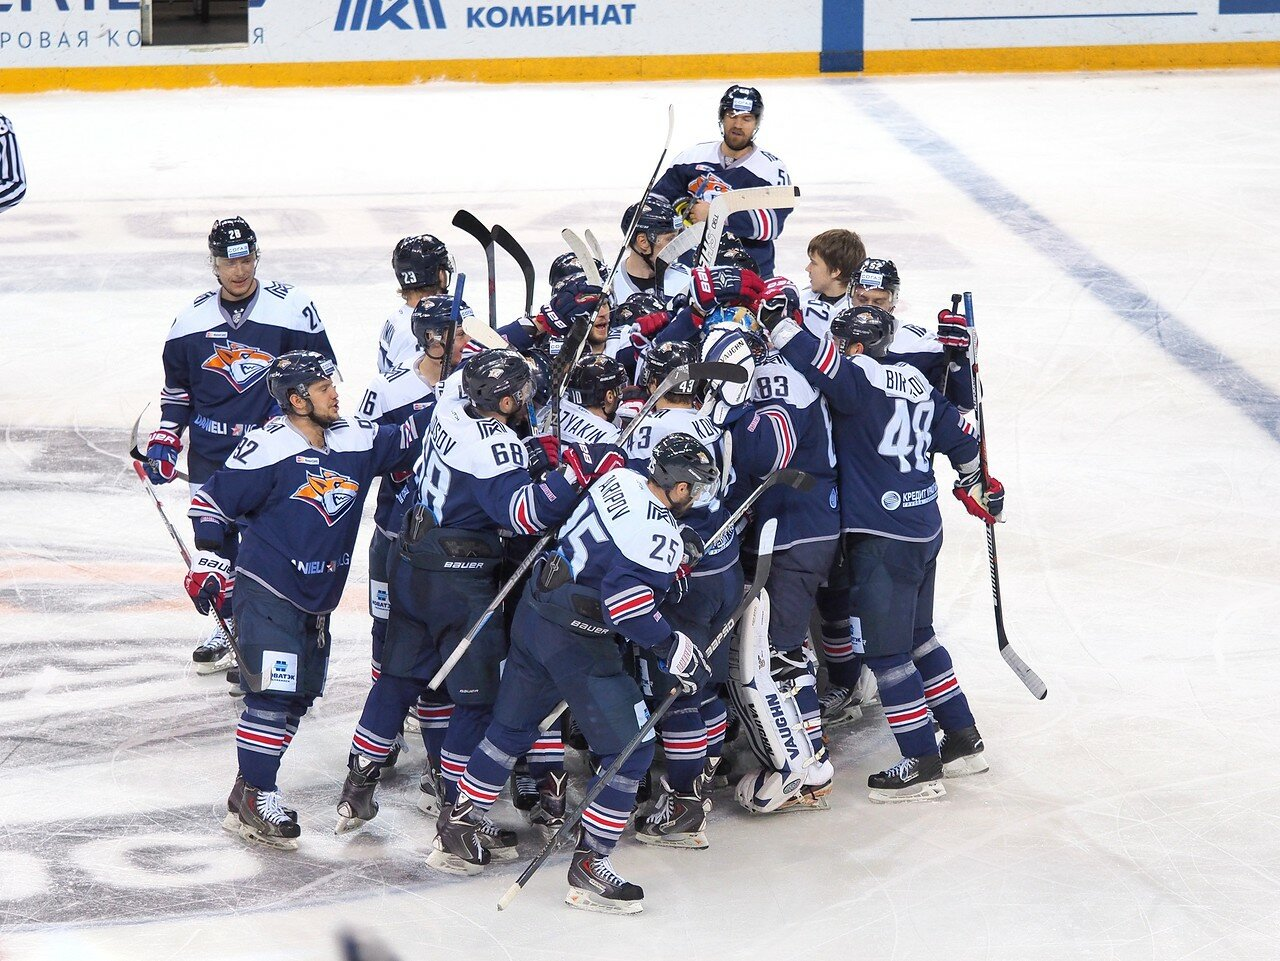 148Плей-офф 2016 Восток Финал Металлург - Салават Юлаев 23.03.2016